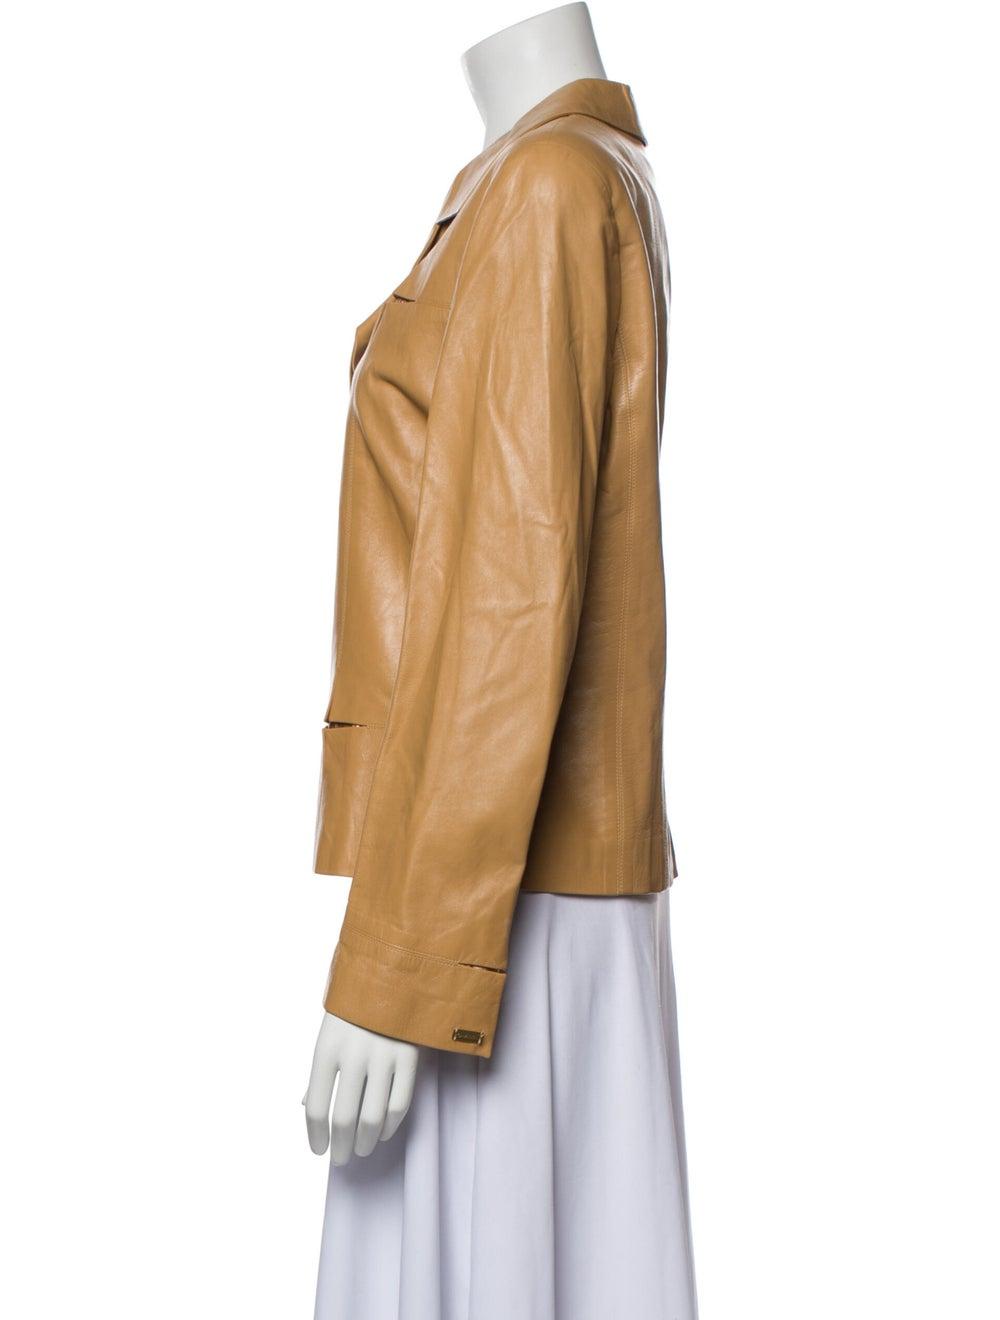 Chanel 2001 Biker Jacket - image 2